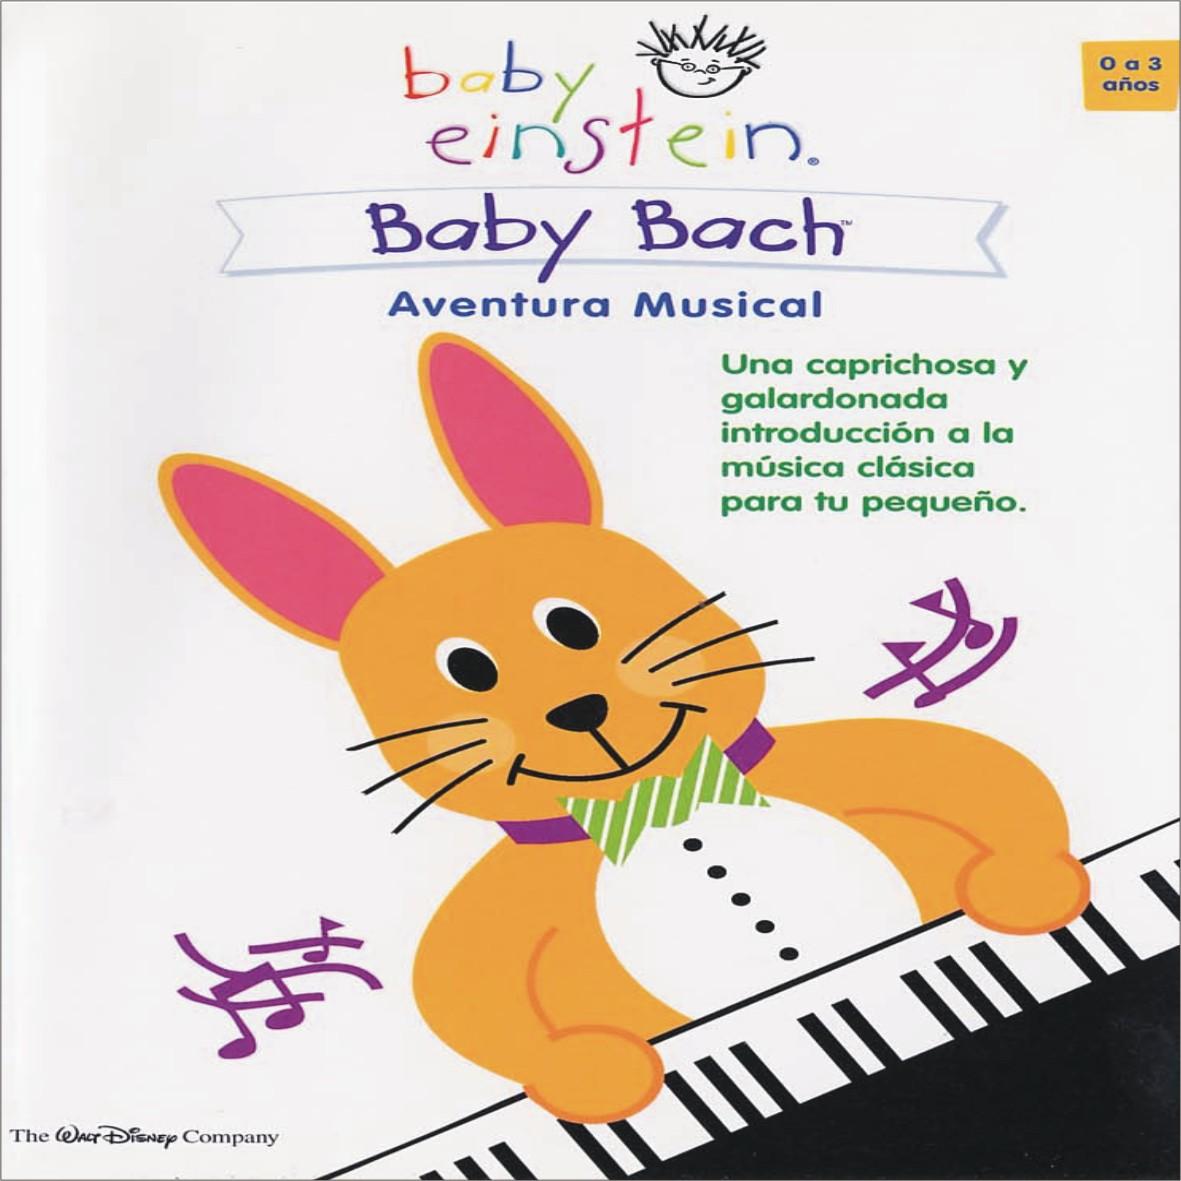 http://3.bp.blogspot.com/__68M6Sx1FDY/TEd3x01mDBI/AAAAAAAAAJ0/BHgx7F49NBw/s1600/Baby_Einstein_-_Baby_Bach--Fr_por_ronaldomake.jpg